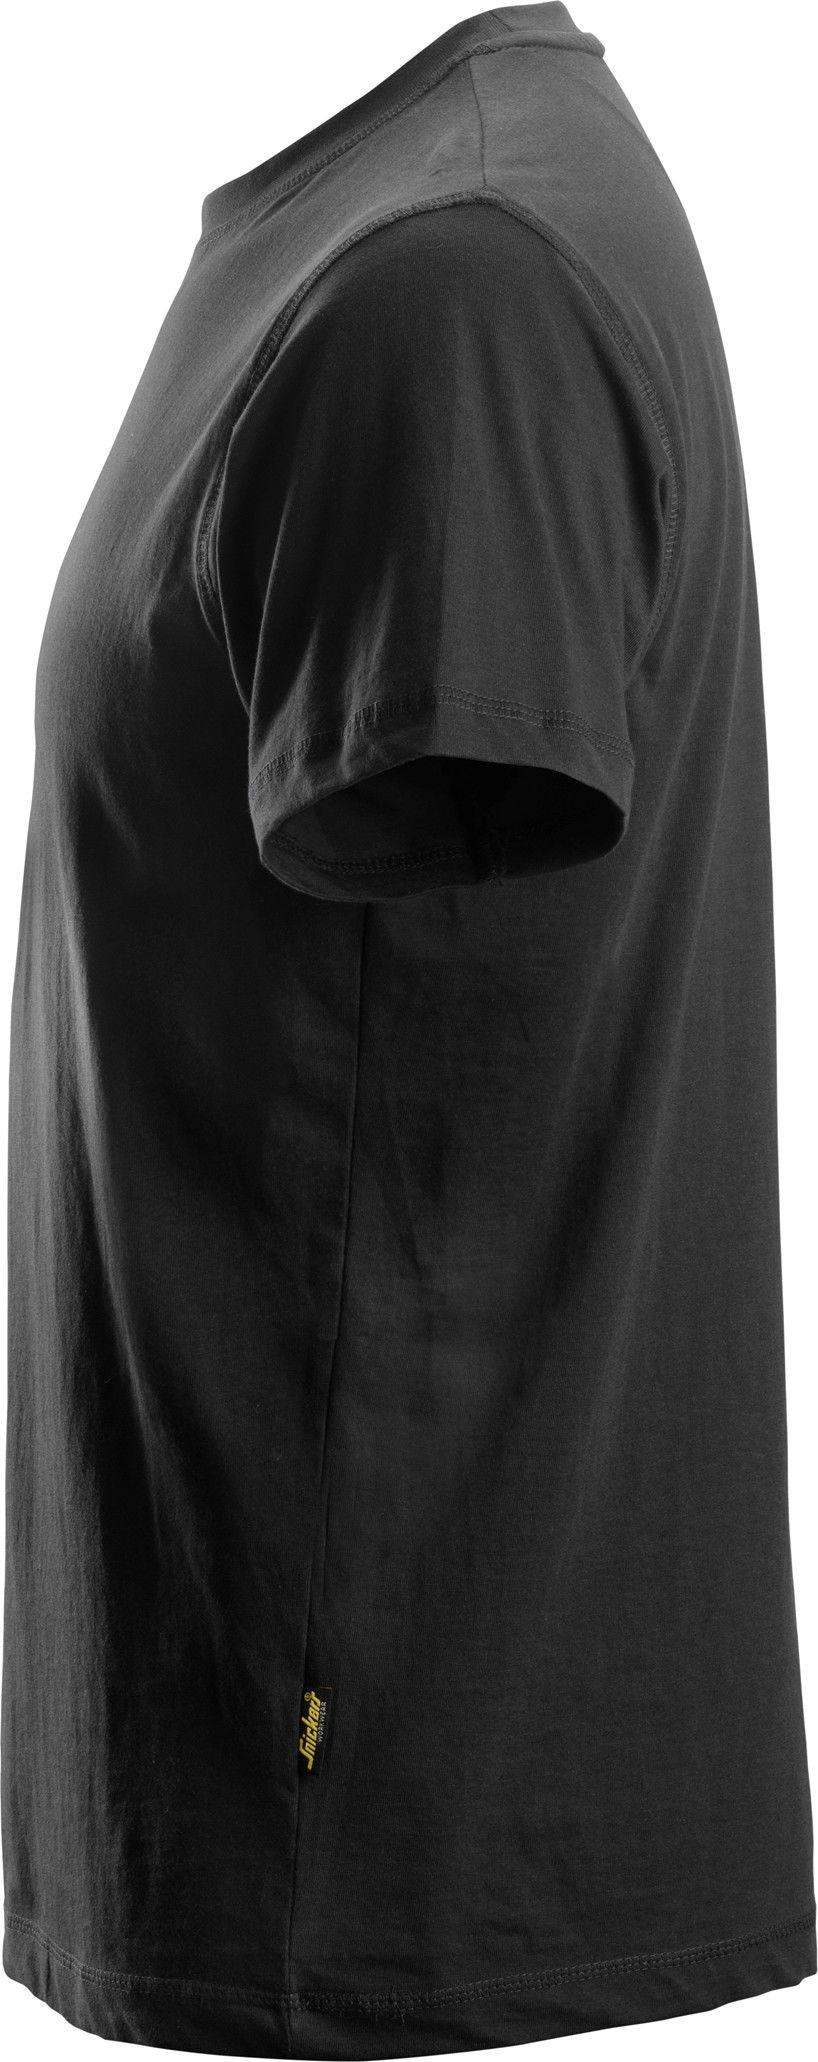 T-shirt koszulka męska, czarna, rozmiar XL, 2502 Snickers [25020400007]